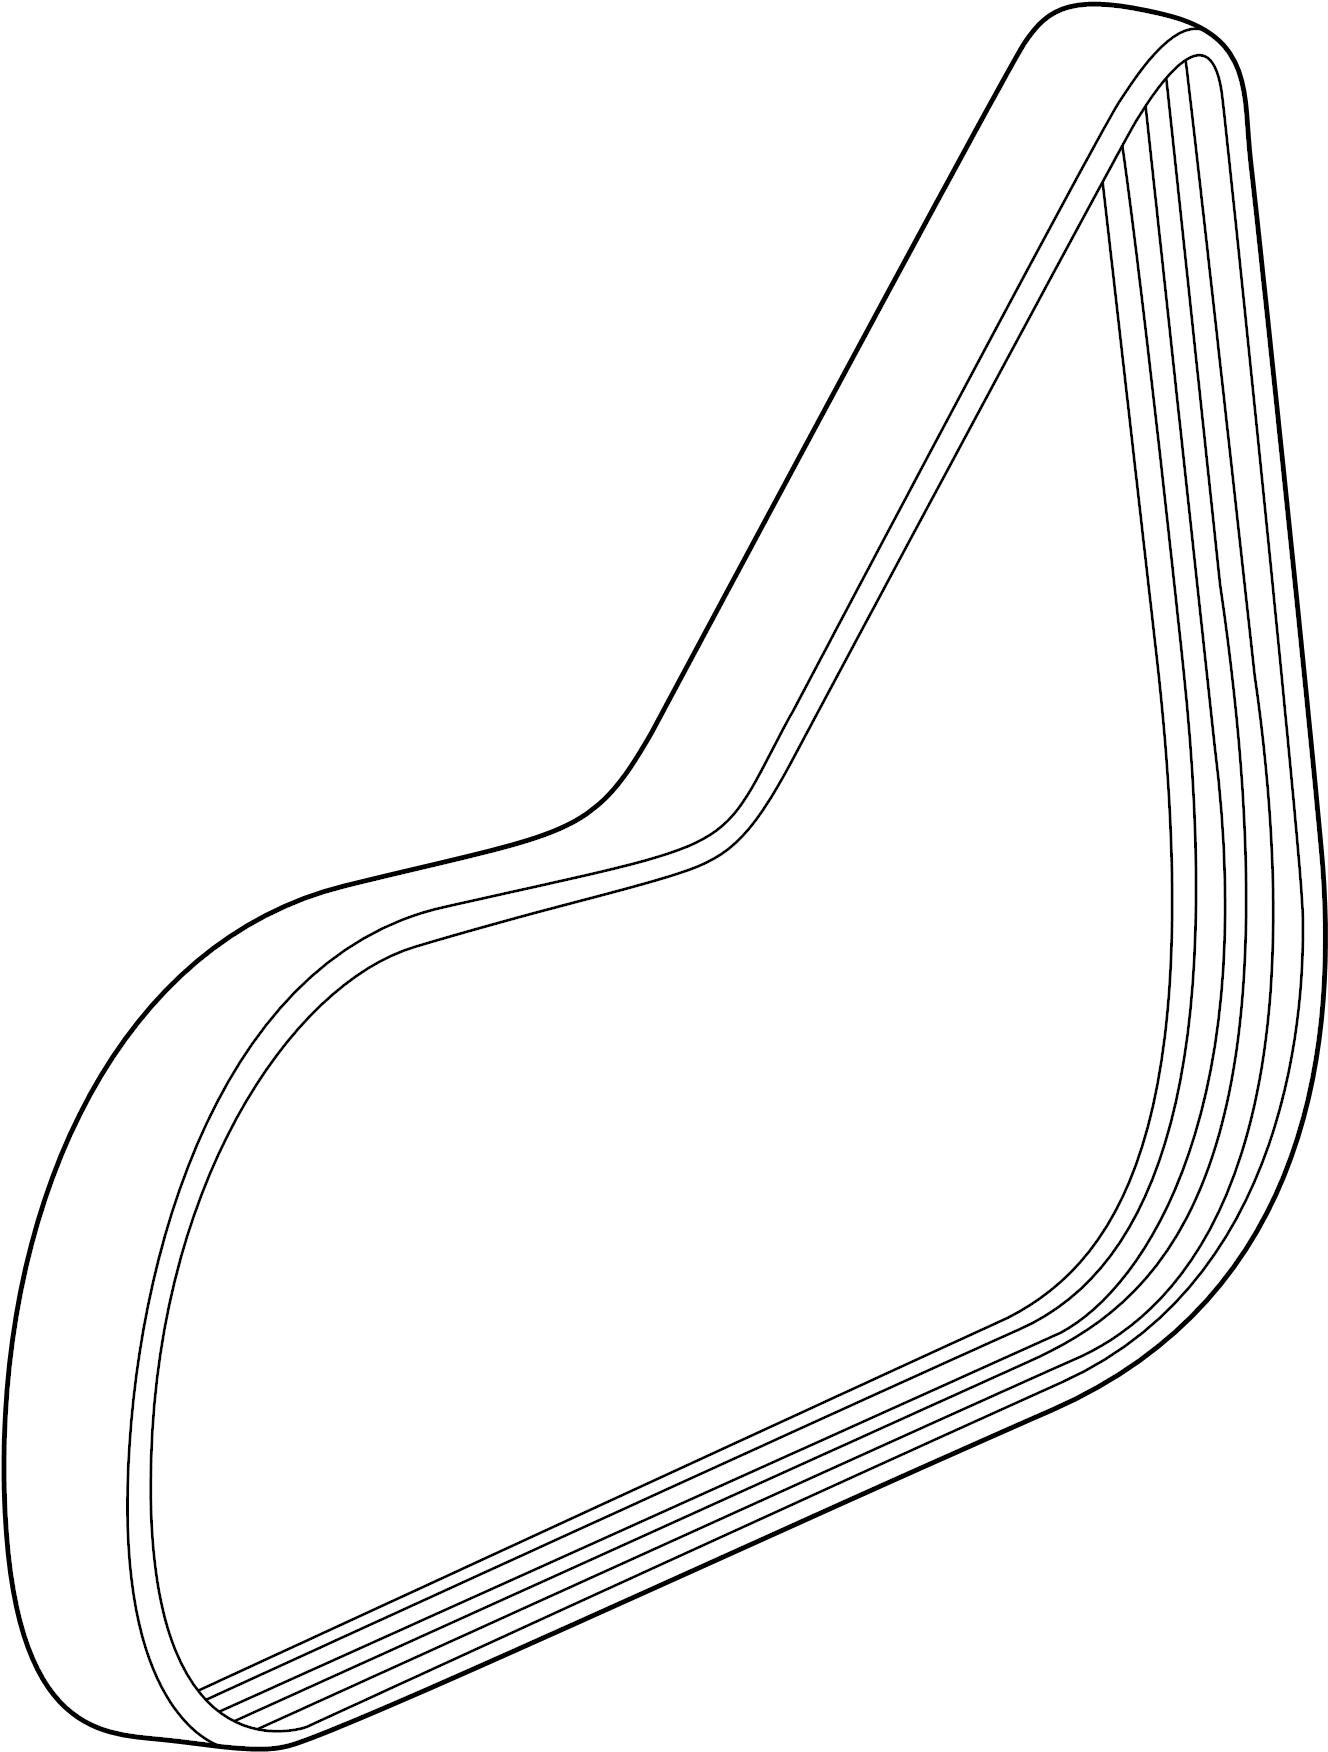 2015 Chevrolet Cruze Belt. Drive. Belt, w/pmp & a/c cmpr